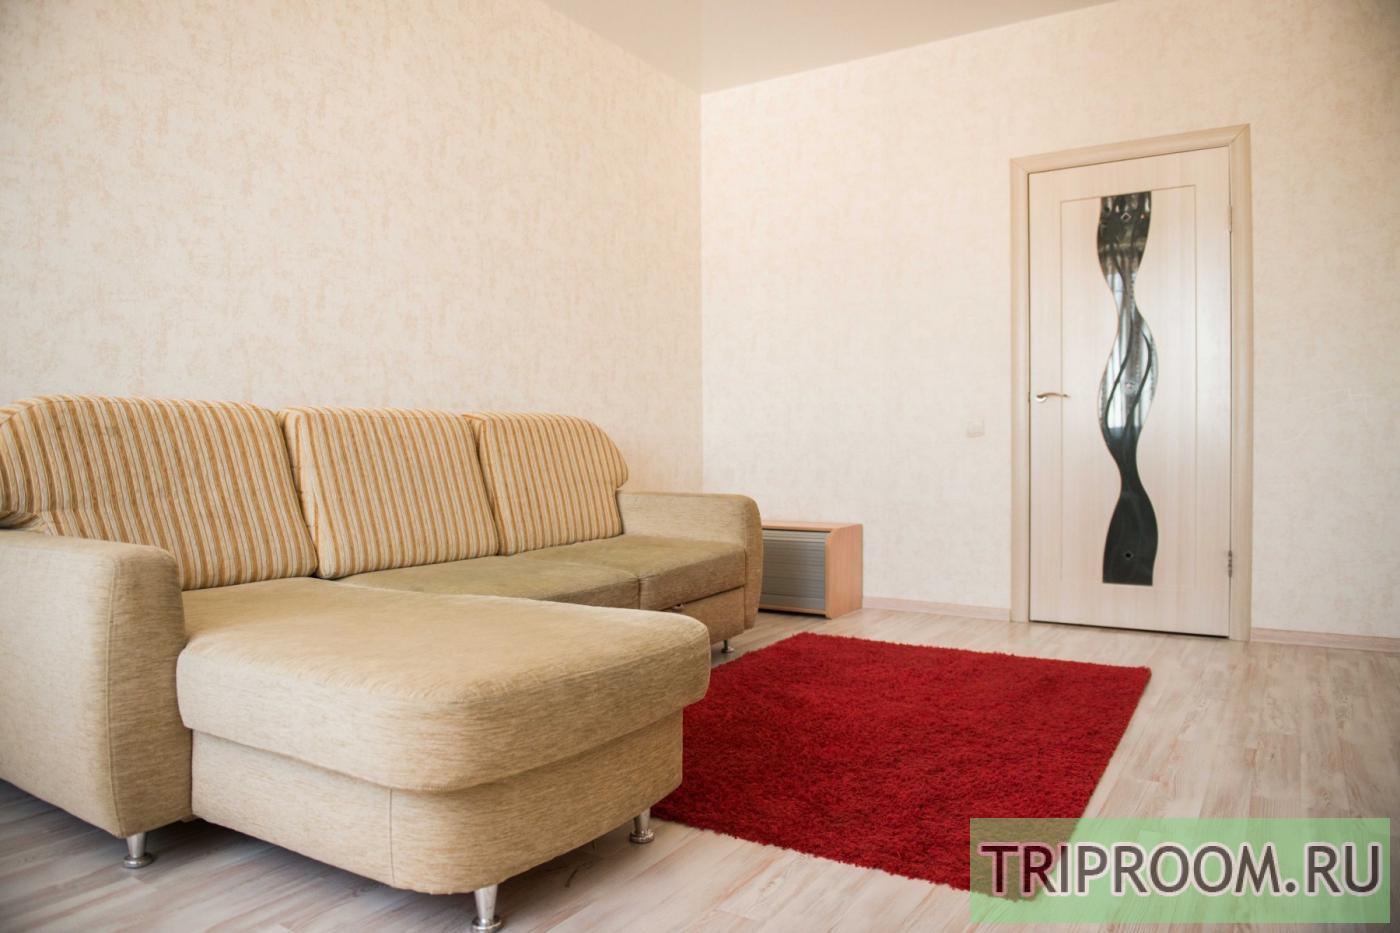 1-комнатная квартира посуточно (вариант № 32598), ул. Гарабурды улица, фото № 9